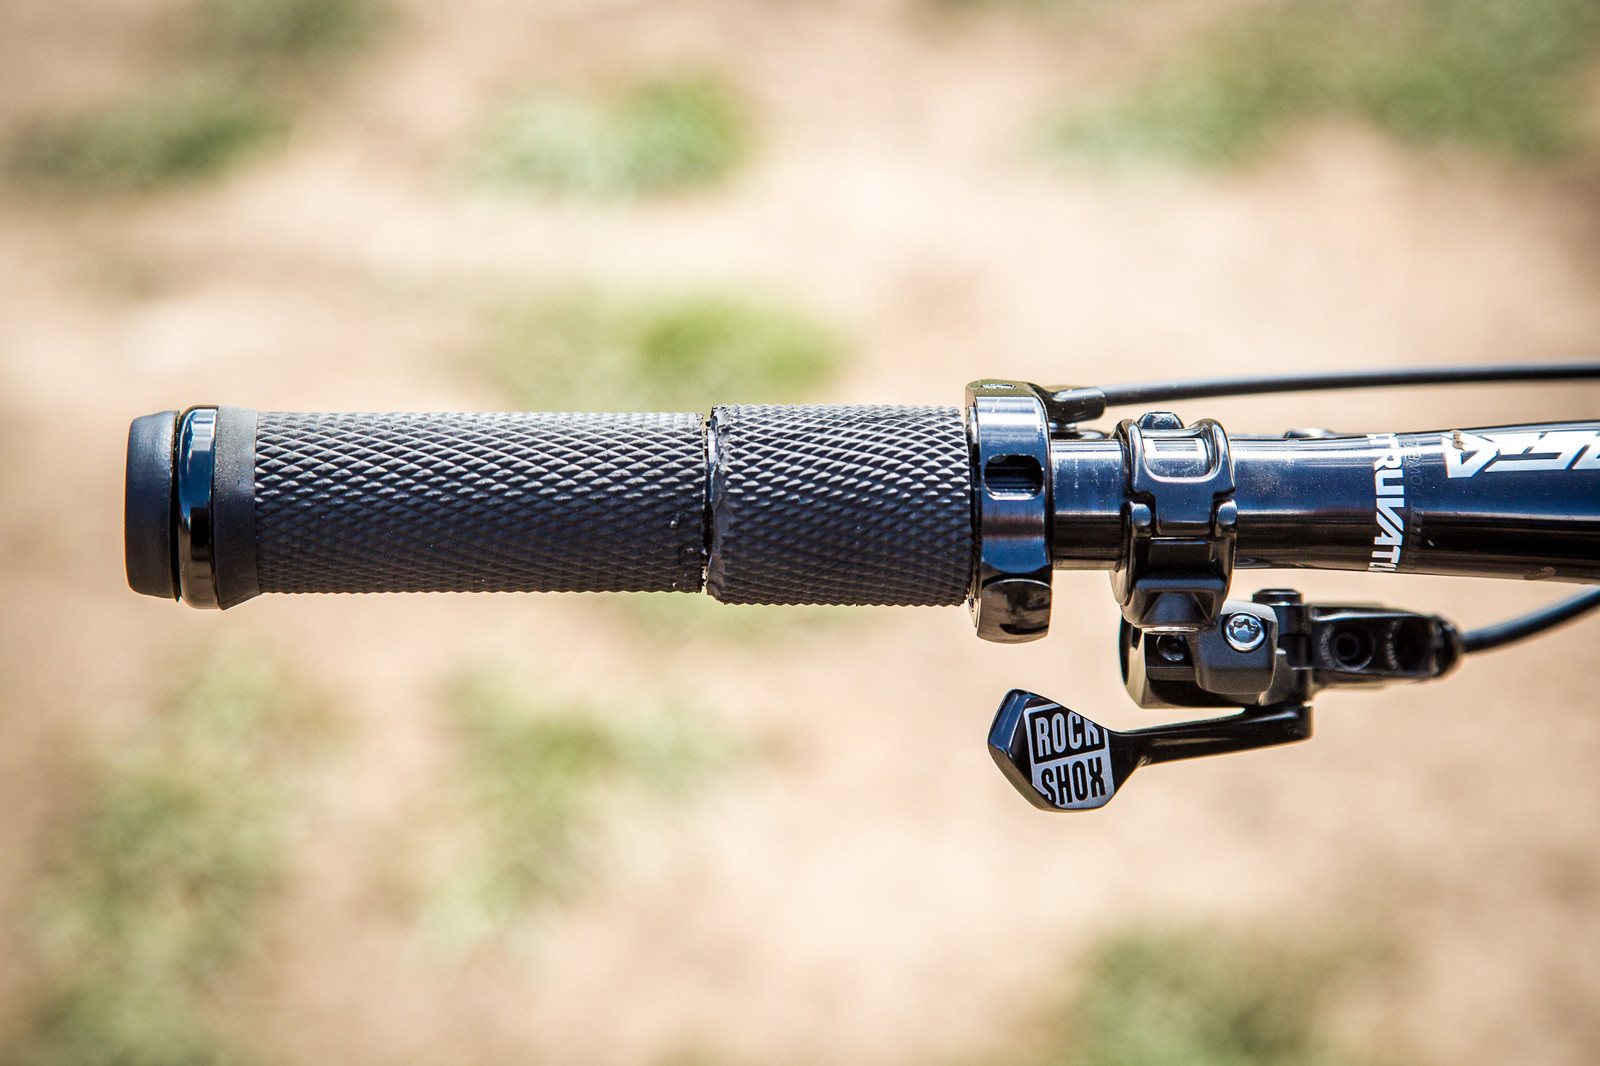 RockShox Twist-Shift Shock Lockout - PIT BITS - Enduro World Series, Aspen - Mountain Biking Pictures - Vital MTB